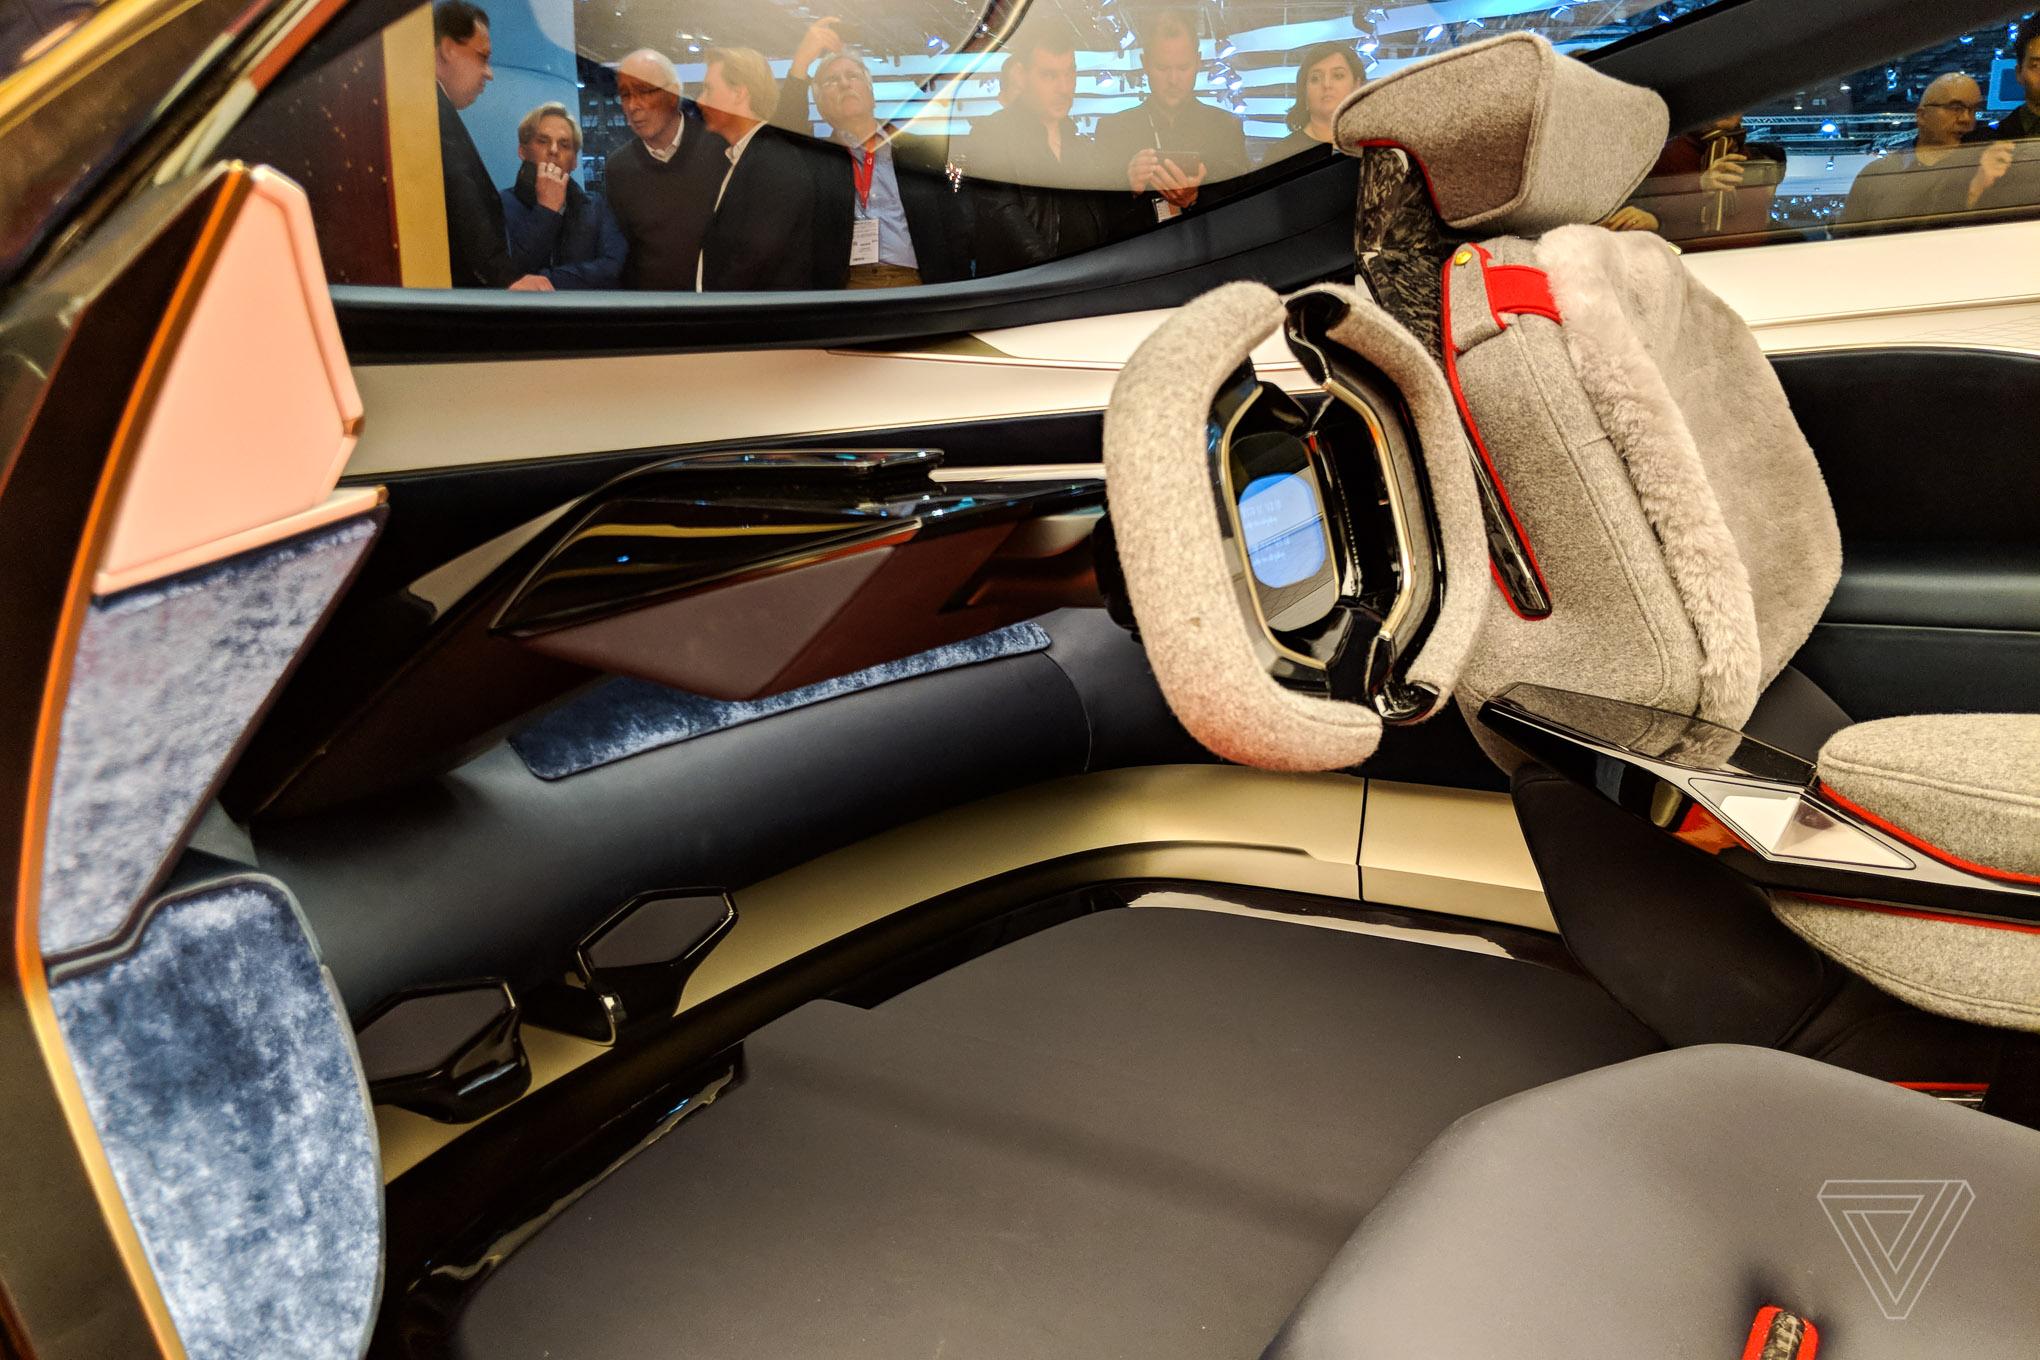 Aston Martin's Lagonda concept car is breathtaking - The Verge